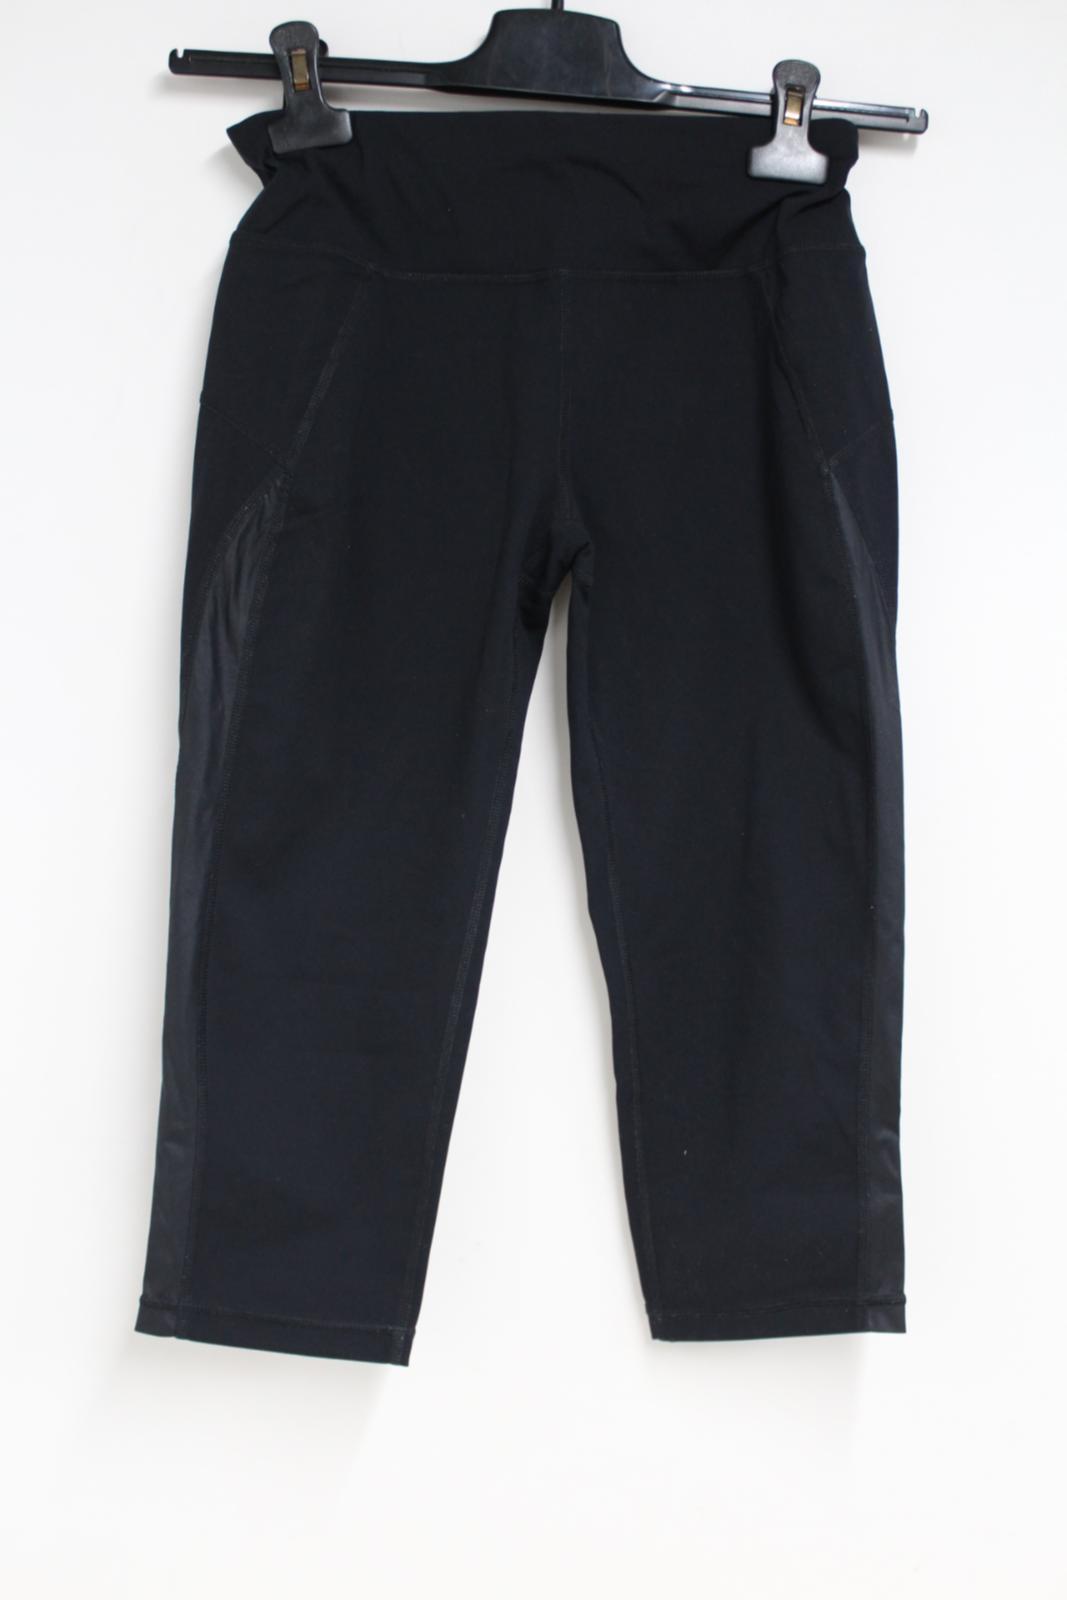 Sweaty-Betty-Ladies-Negro-3-4-piernas-Corto-Leggings-Activewear-pequeno-W26-L16 miniatura 3